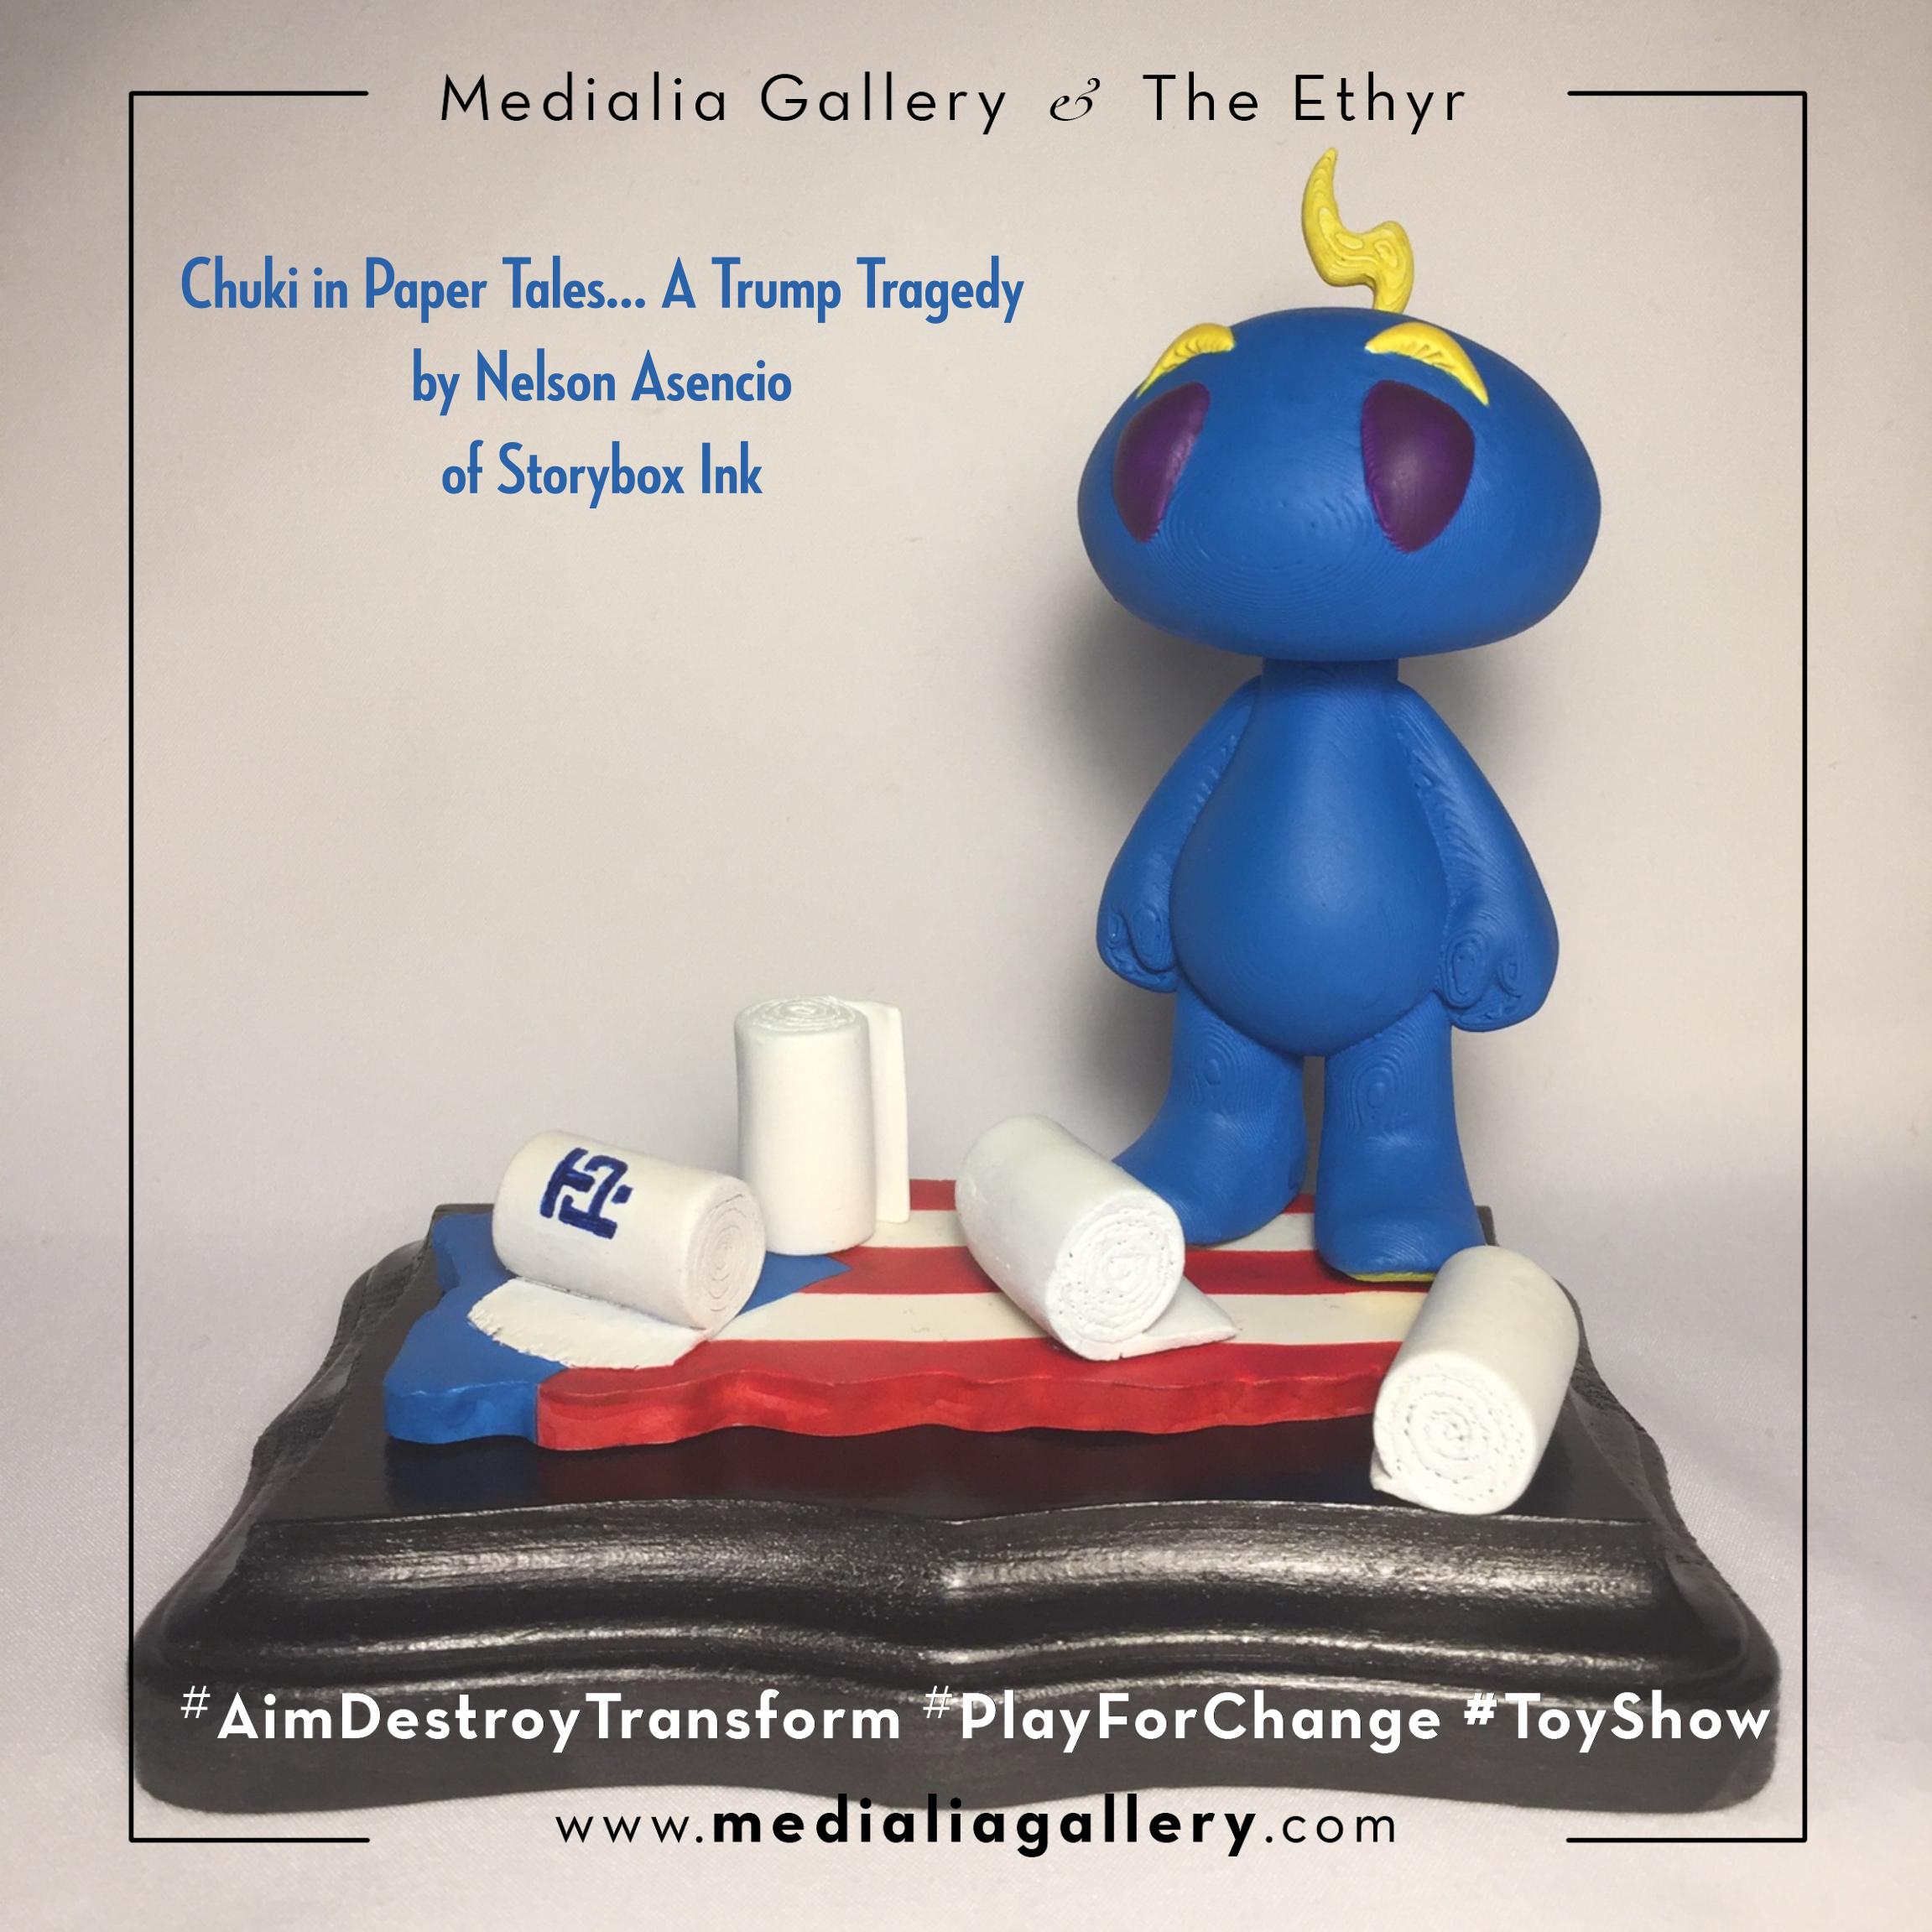 MedialiaGallery_The_Ethyr_AimDestroyTransform_Toy_Show_announcement_Chuki_Nelson_Asencio_Storybox_Ink_Paper_Tales_November_2017.jpg.png